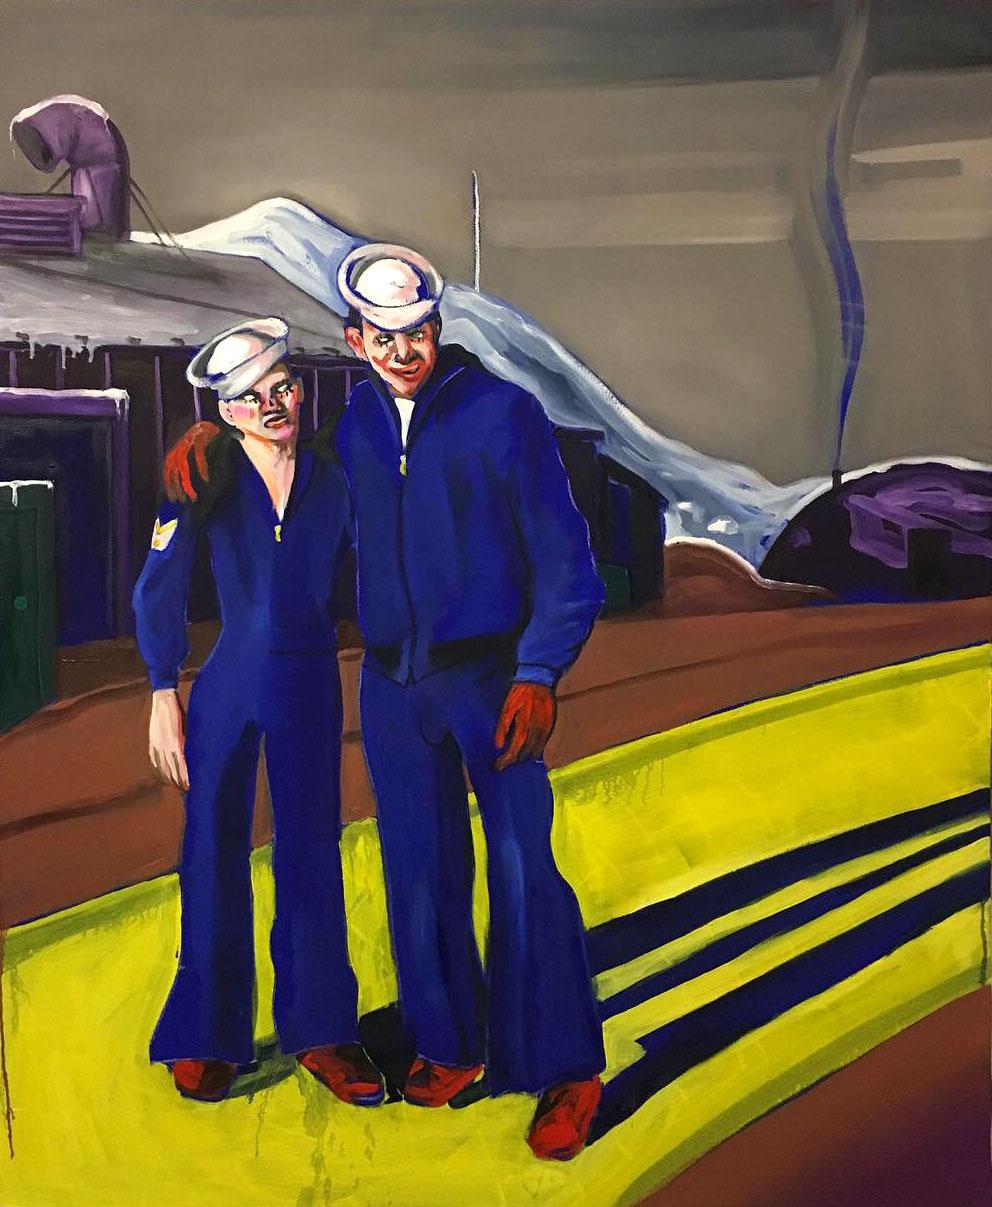 'Hello Sailor', 2019 Adam Baker Oil on canvas, 120cm x 150cm